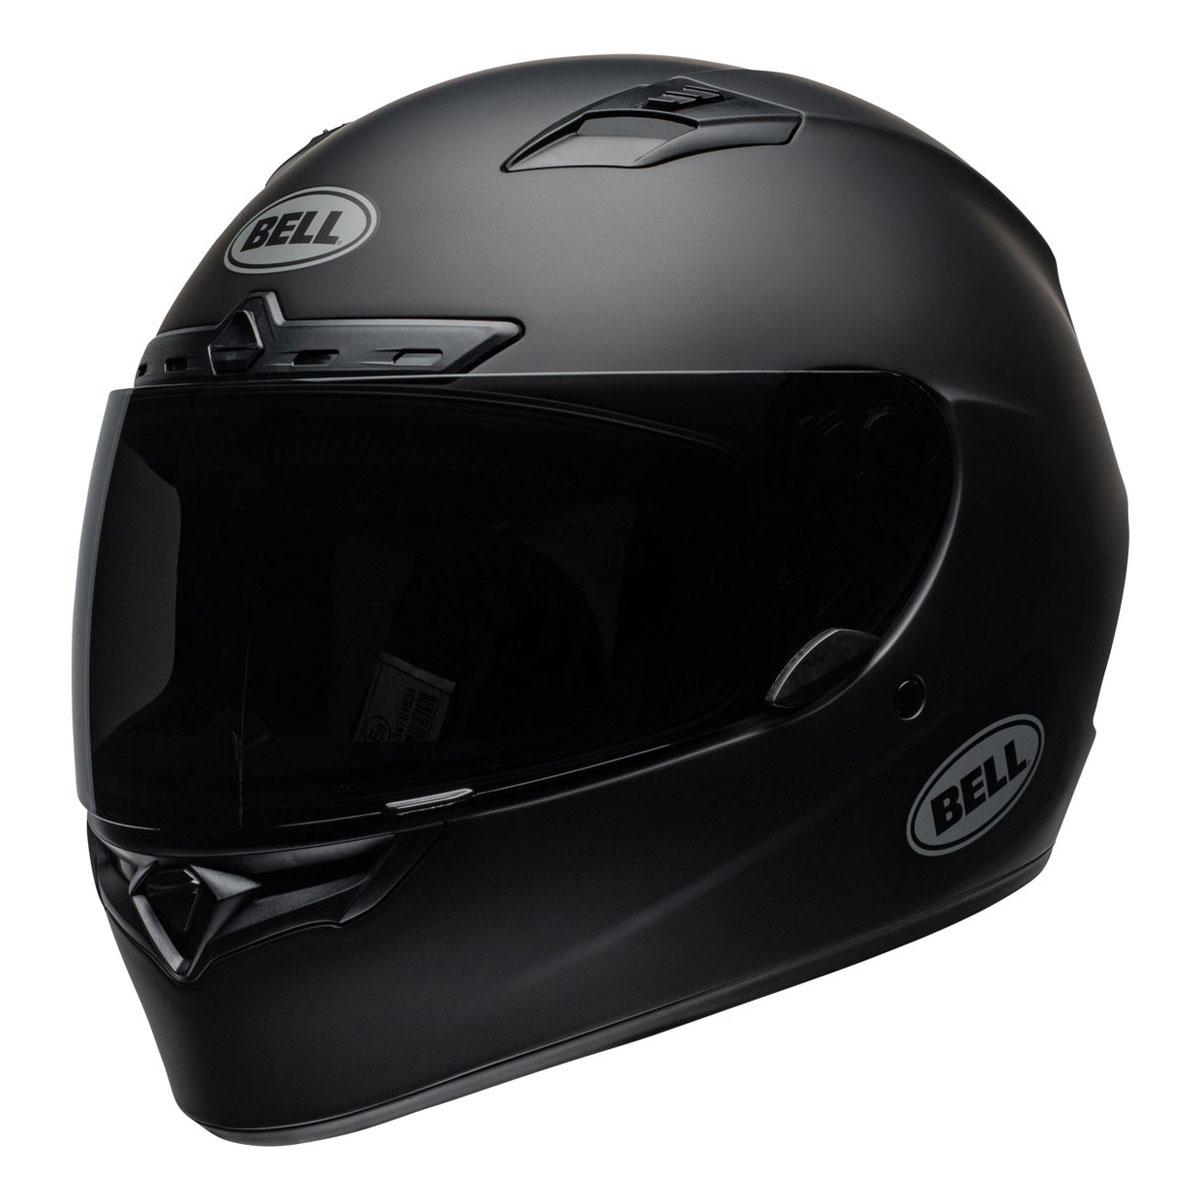 Bell Qualifier DLX MIPS Matte Black Full Face Helmet